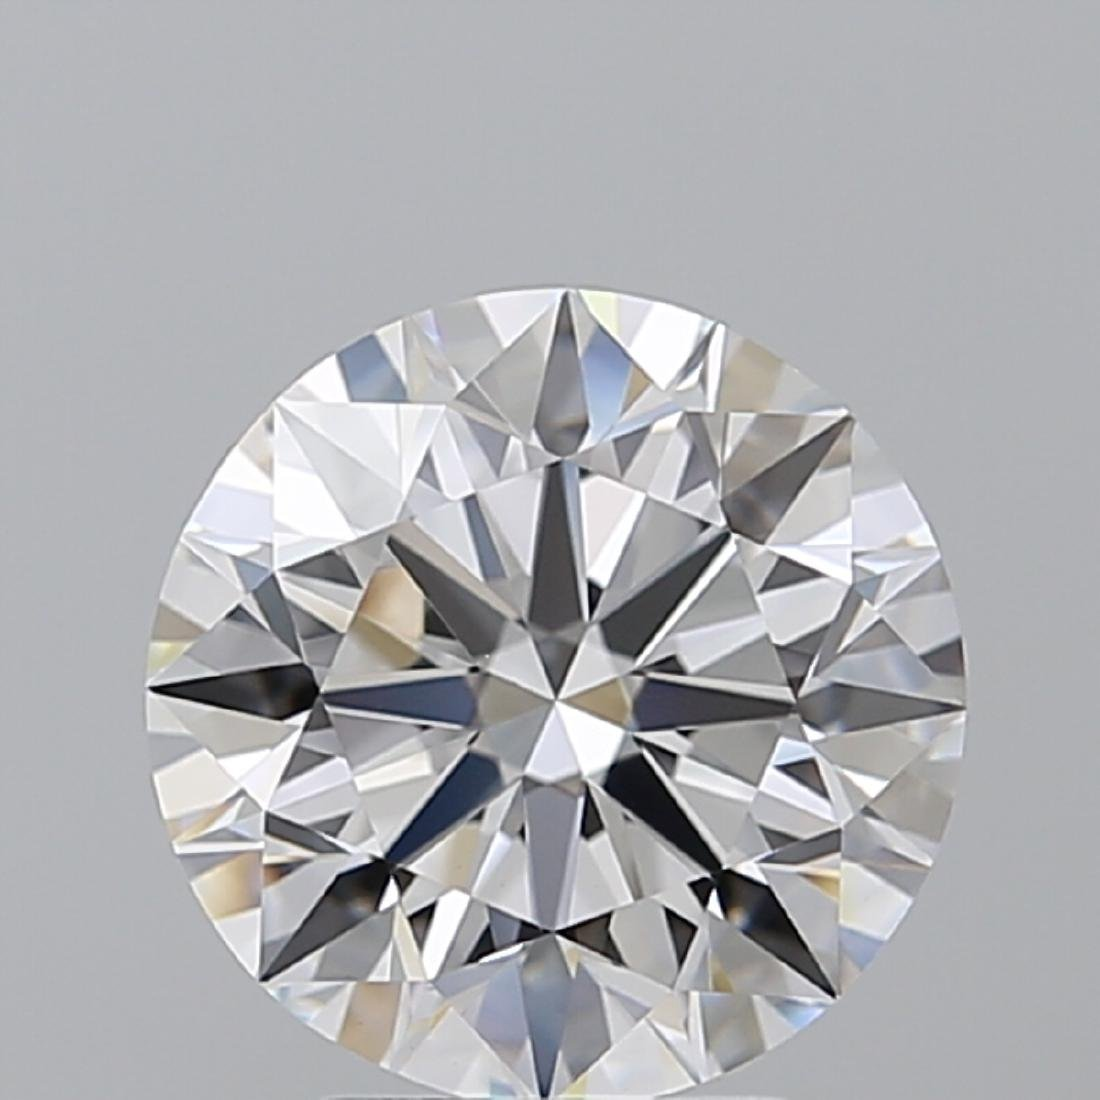 3.05 ct, Color D/VS1, Round cut Diamond - 2